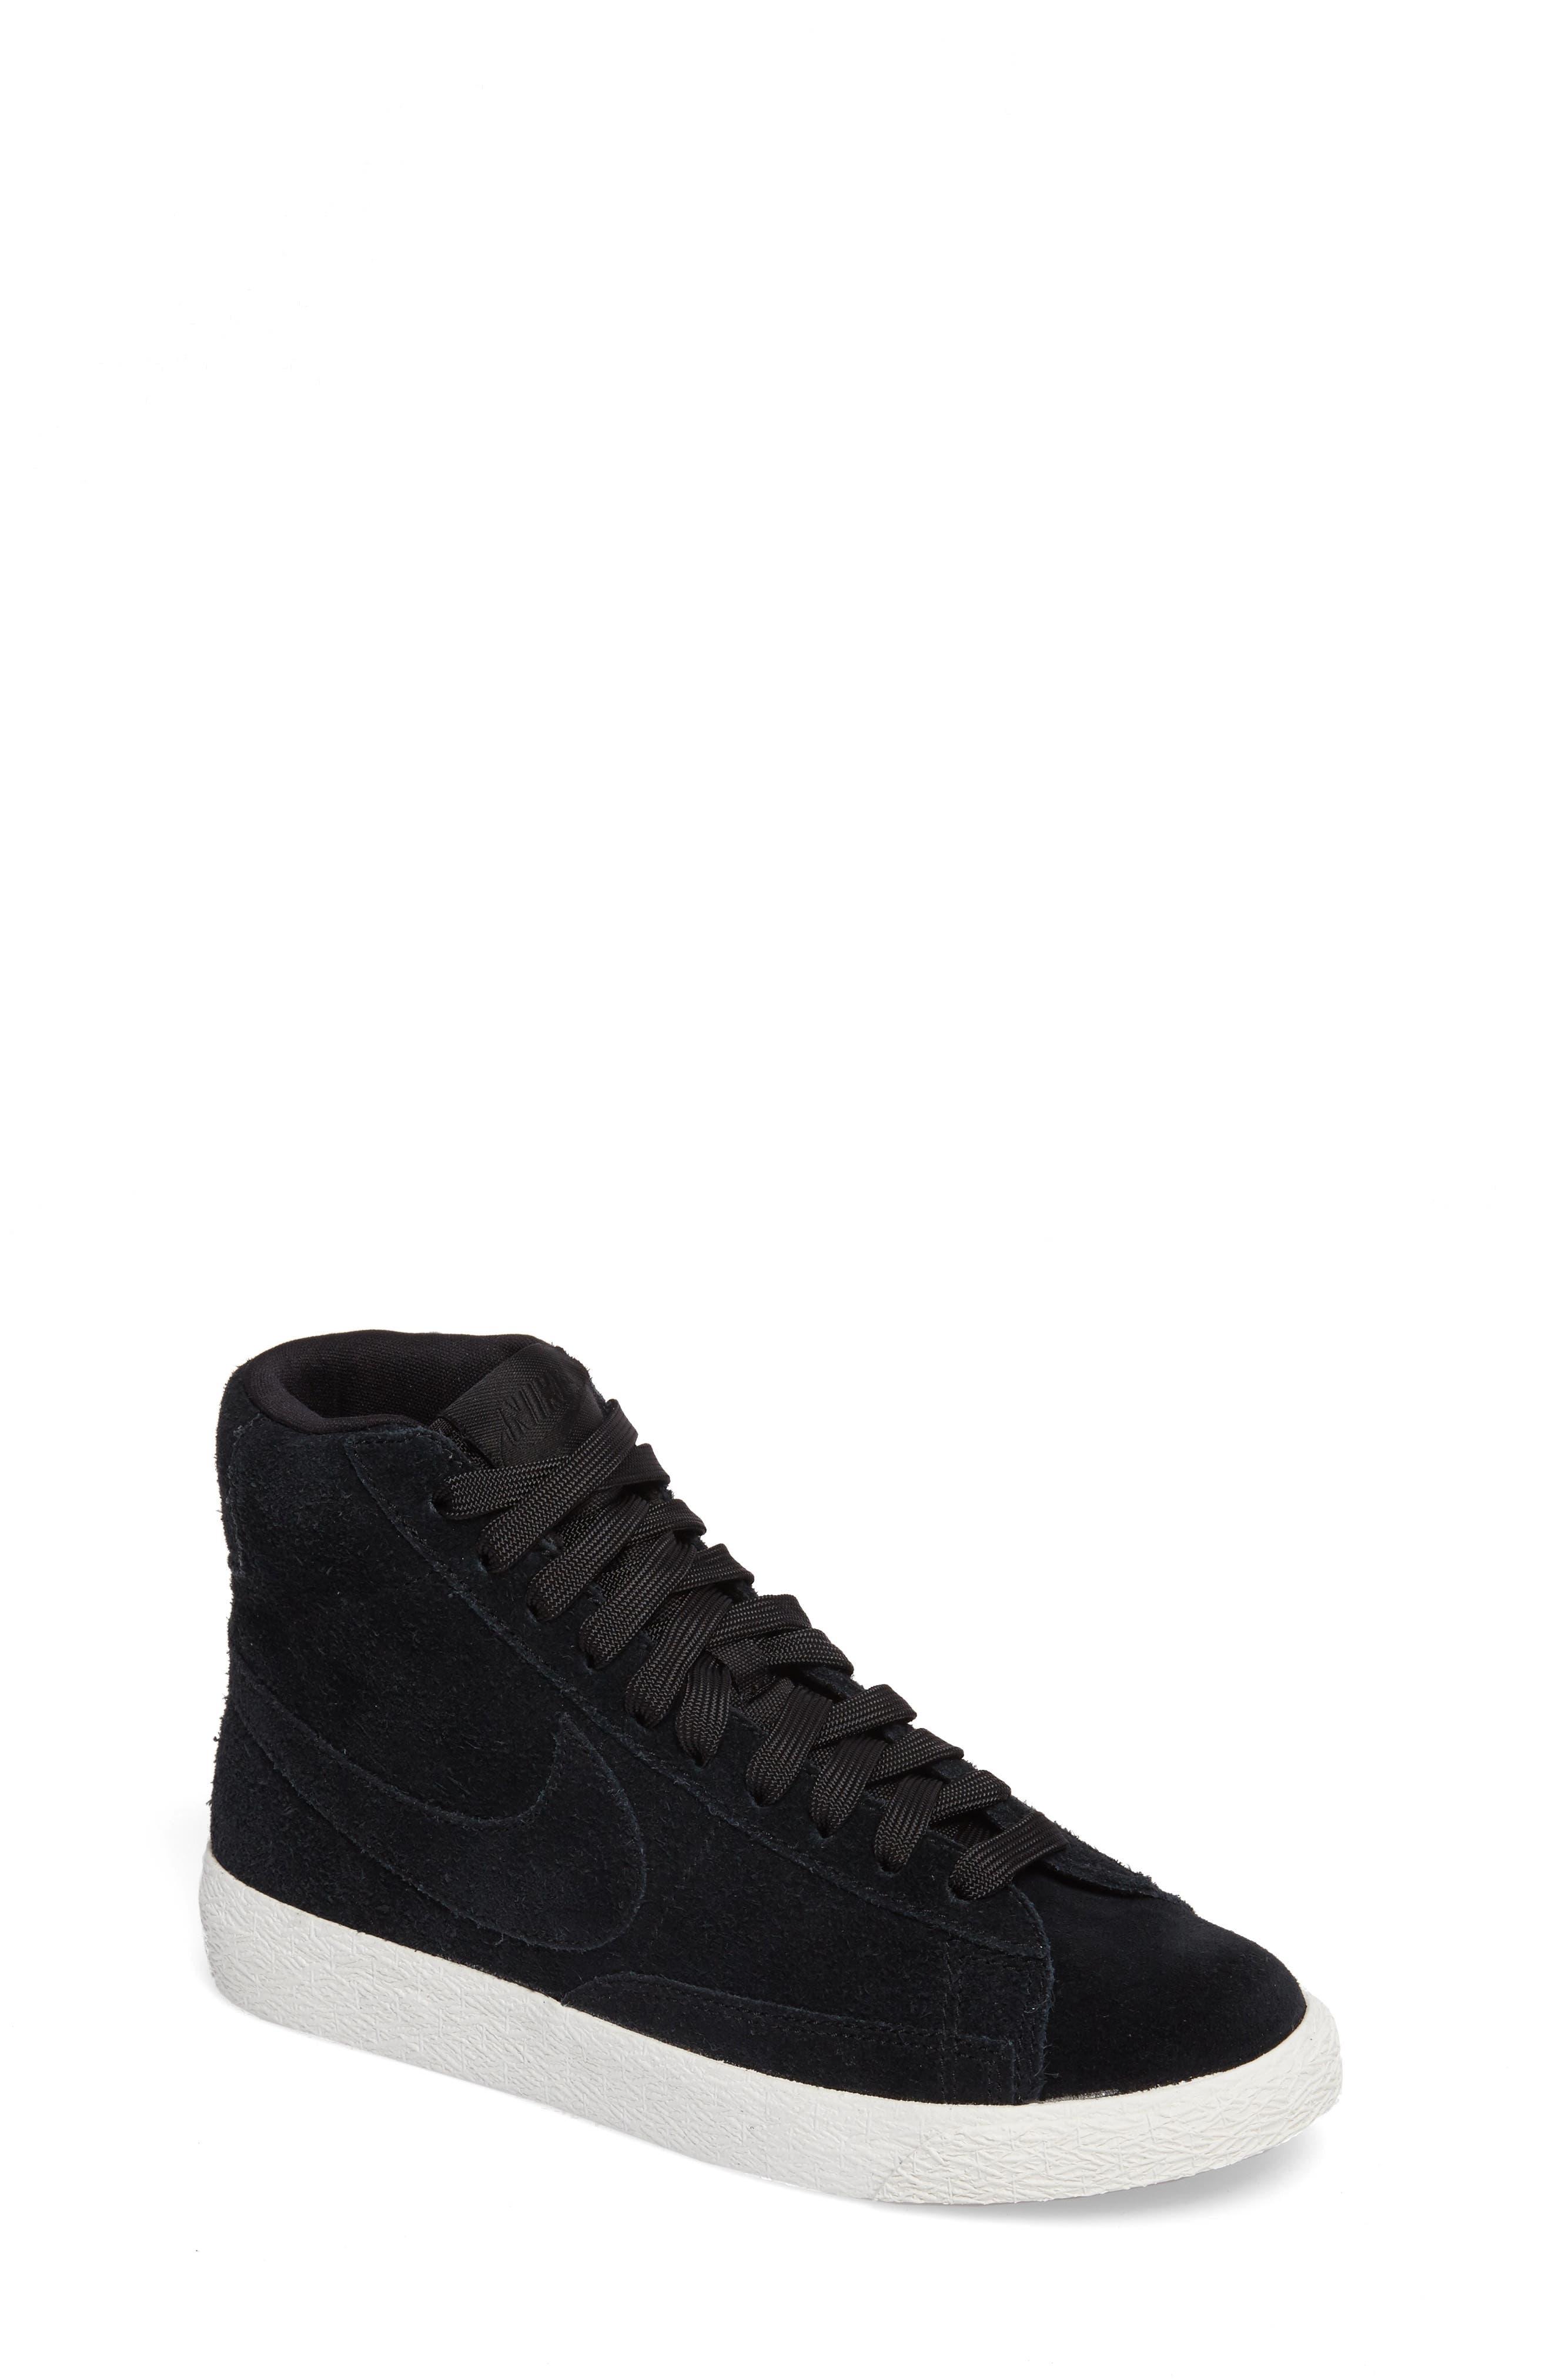 Blazer Mid High Top Sneaker,                         Main,                         color, 003